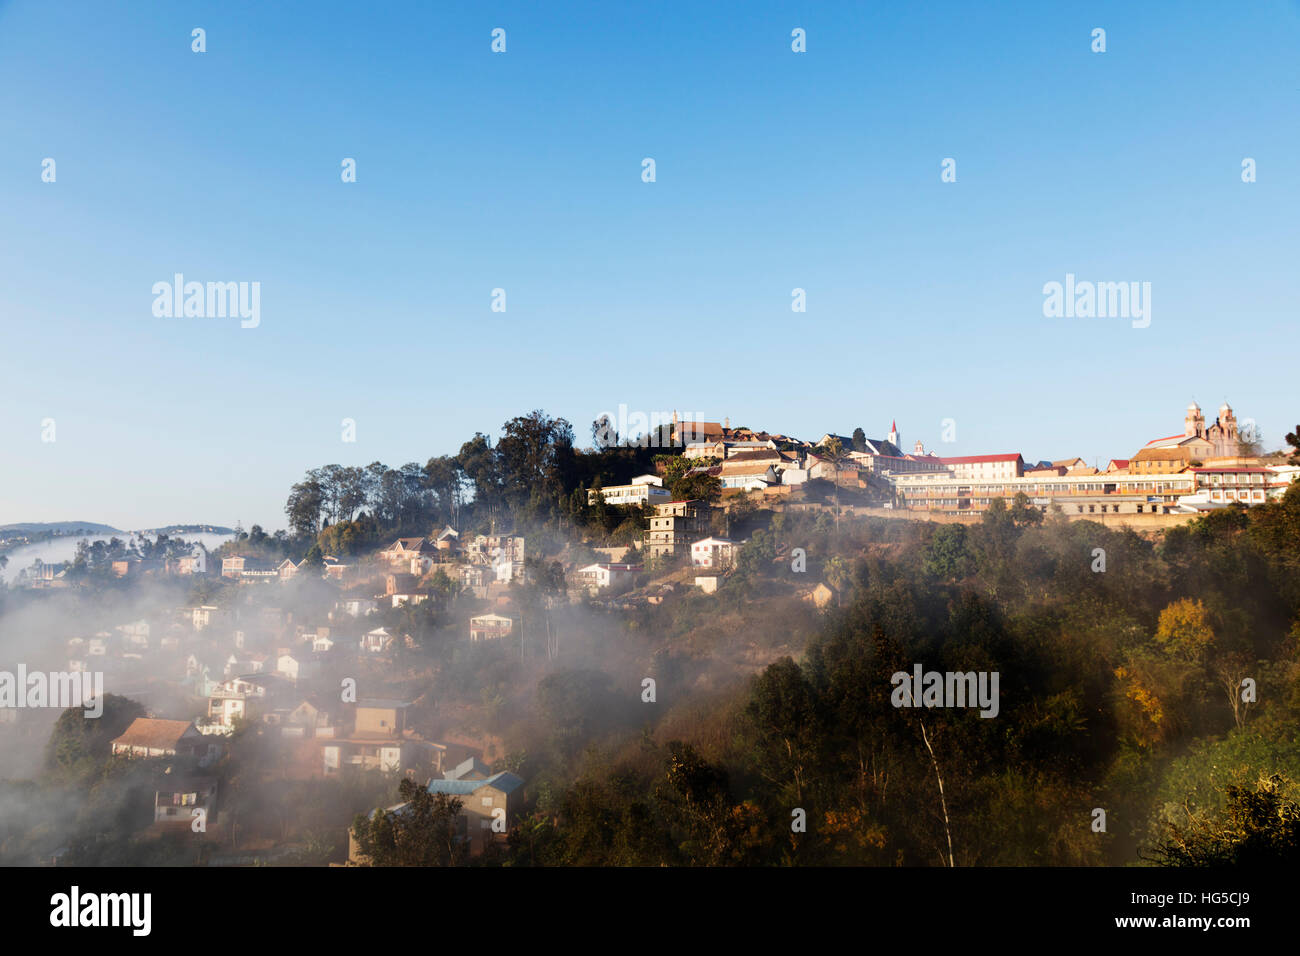 Fianarantsoa, early morning mist on the Haute Ville old town, central area - Stock Image